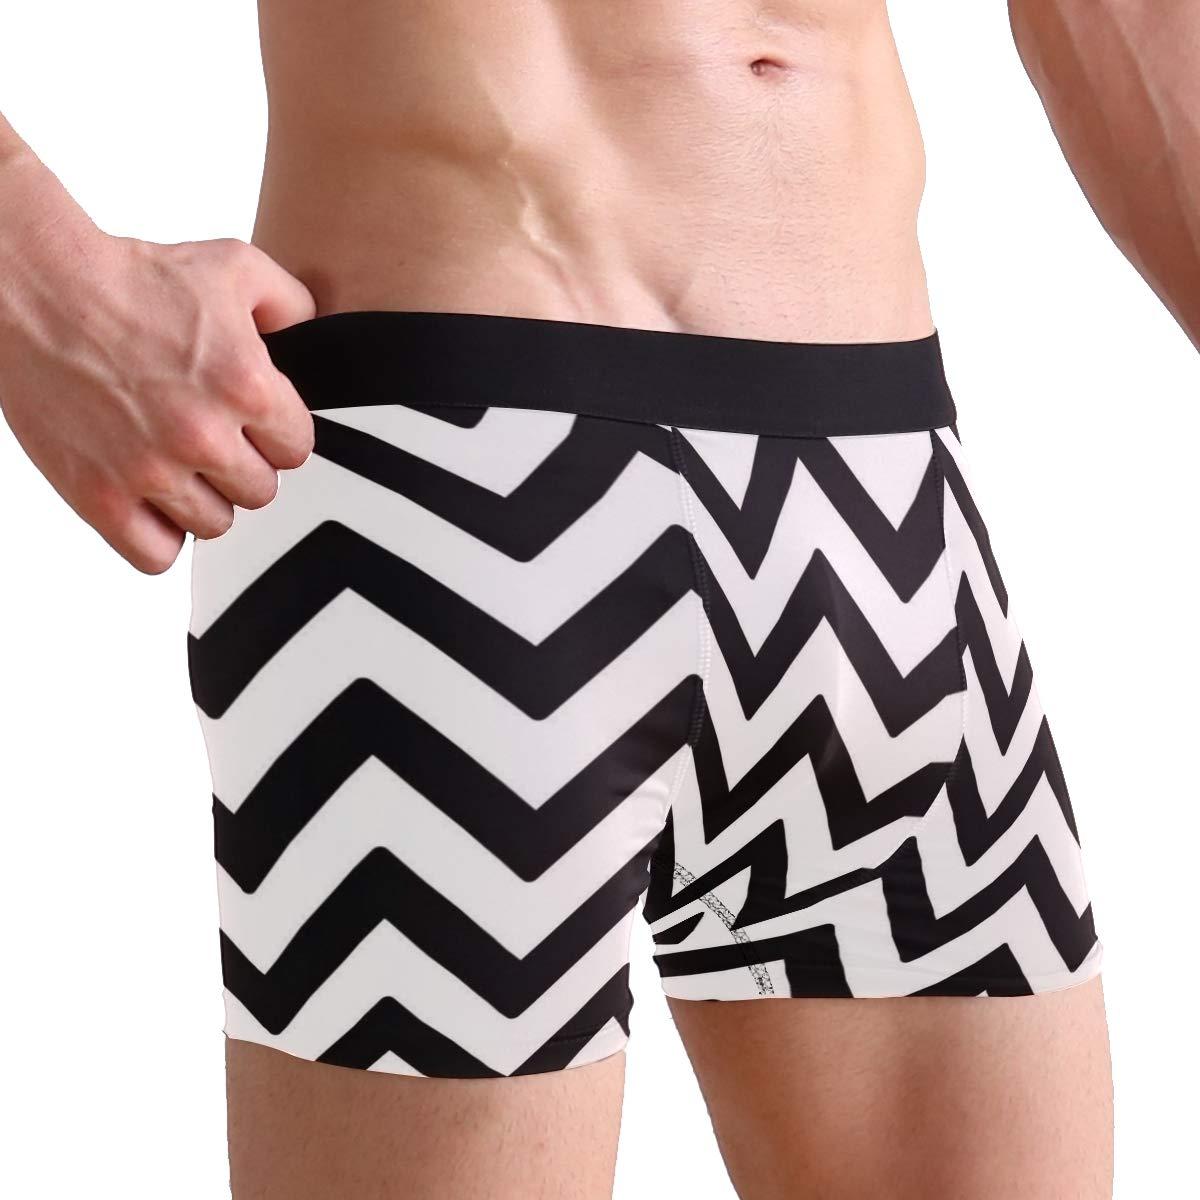 Josid Mens Beach Swimming Trunks Boxer Brief Swimsuit Swim Underwear Board Shorts S